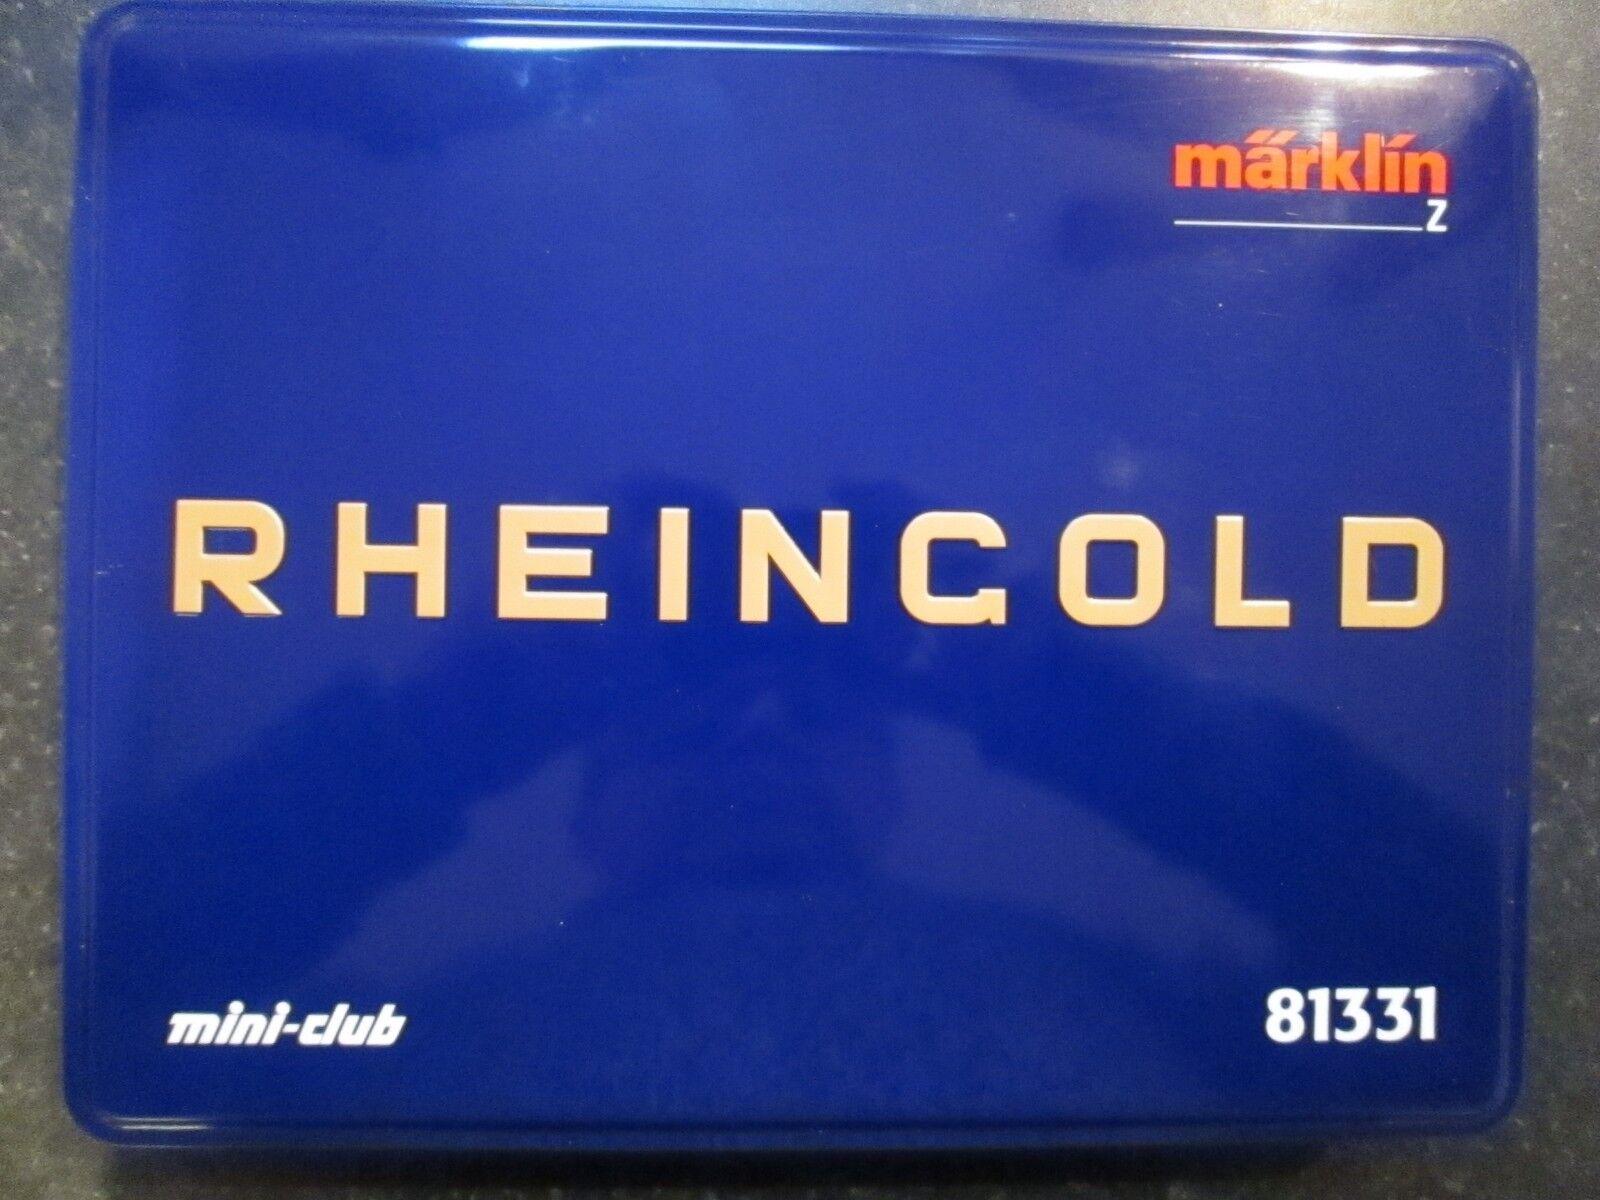 Marklin spur z scale/gauge  75 Years of the Rheinoro  Train Set. V Rare.